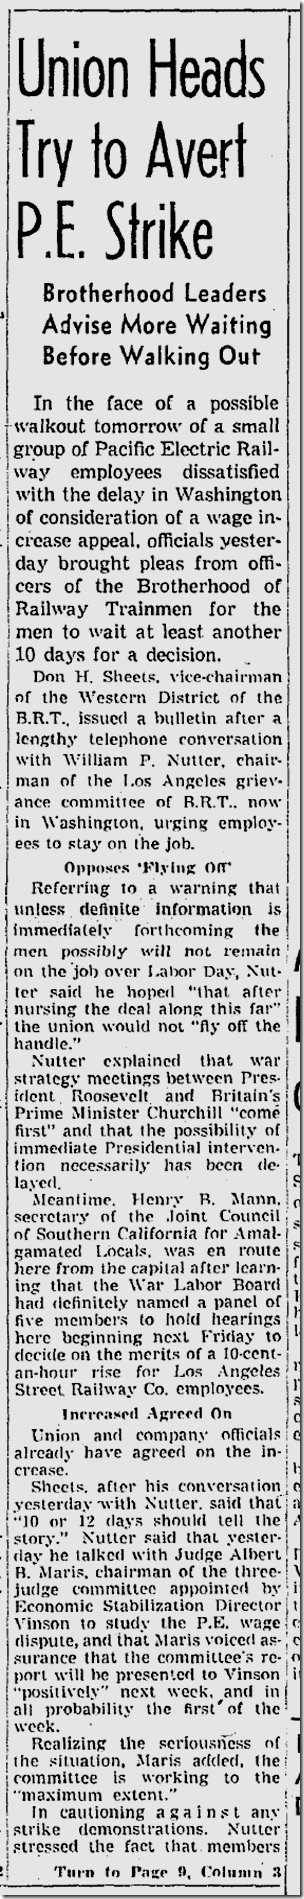 Sept. 5, 1943, Streetcar Strike